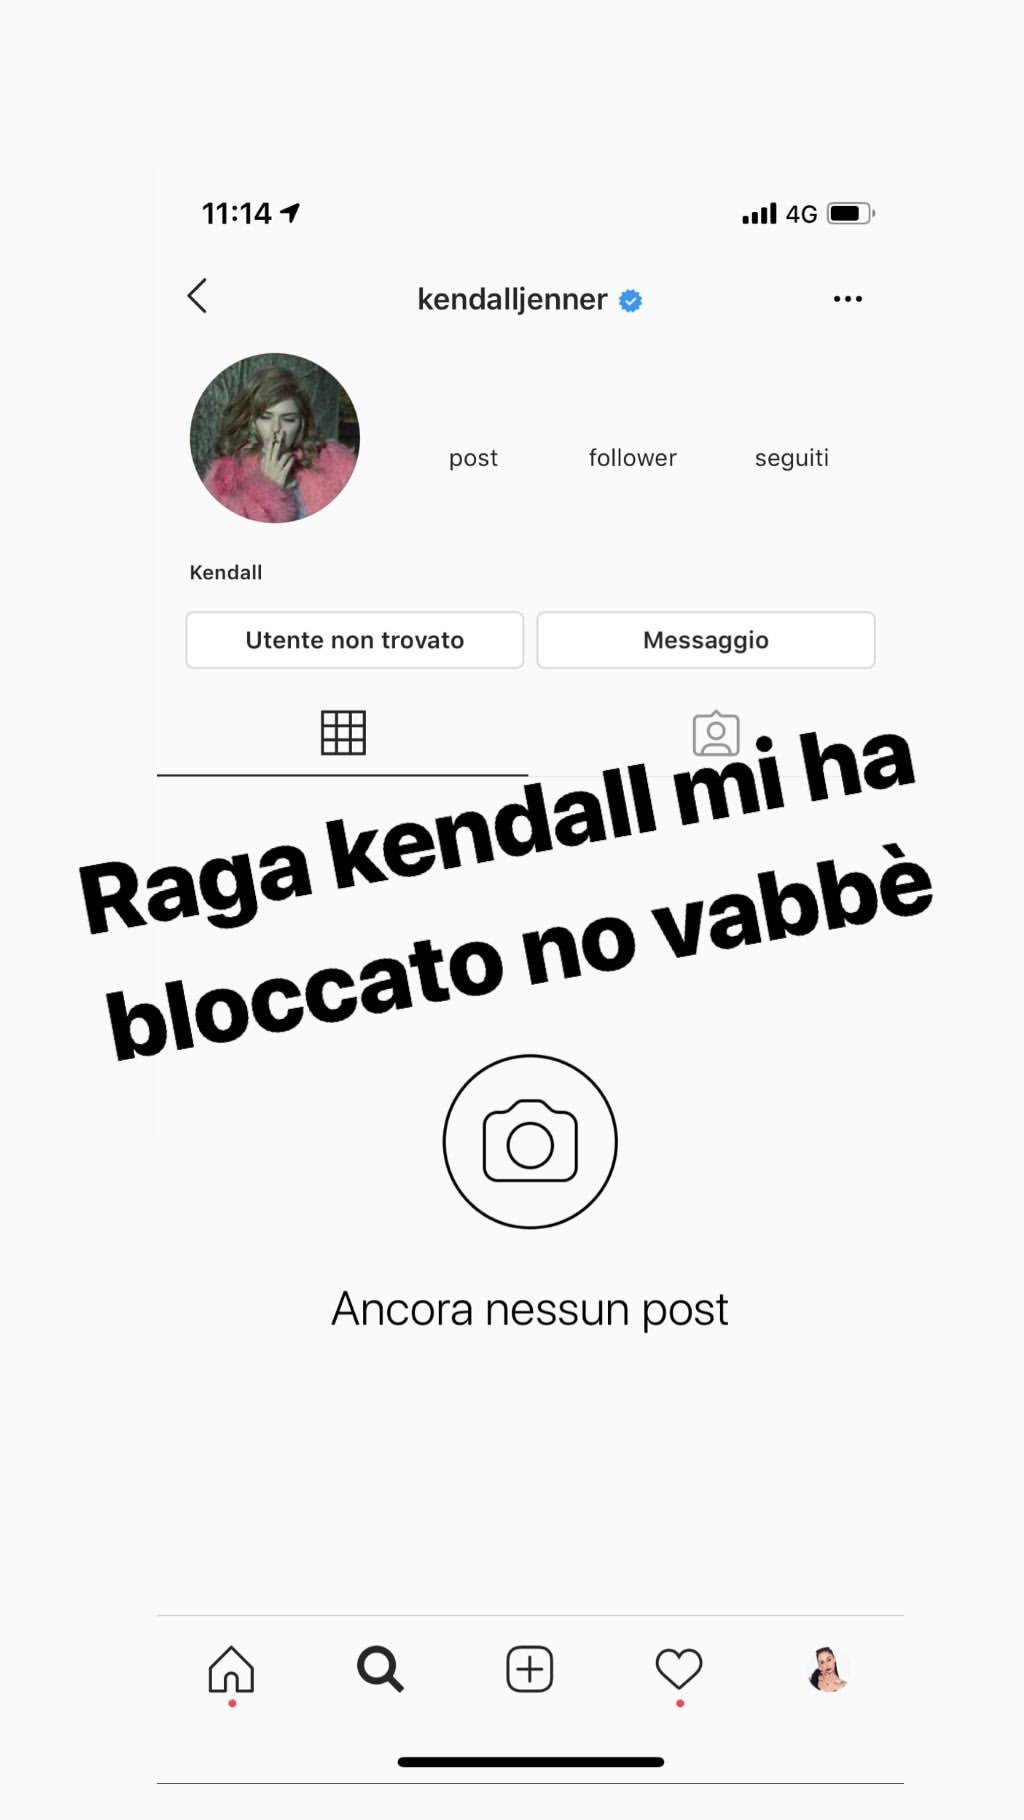 storia instagram valentina dallari kendall jenner